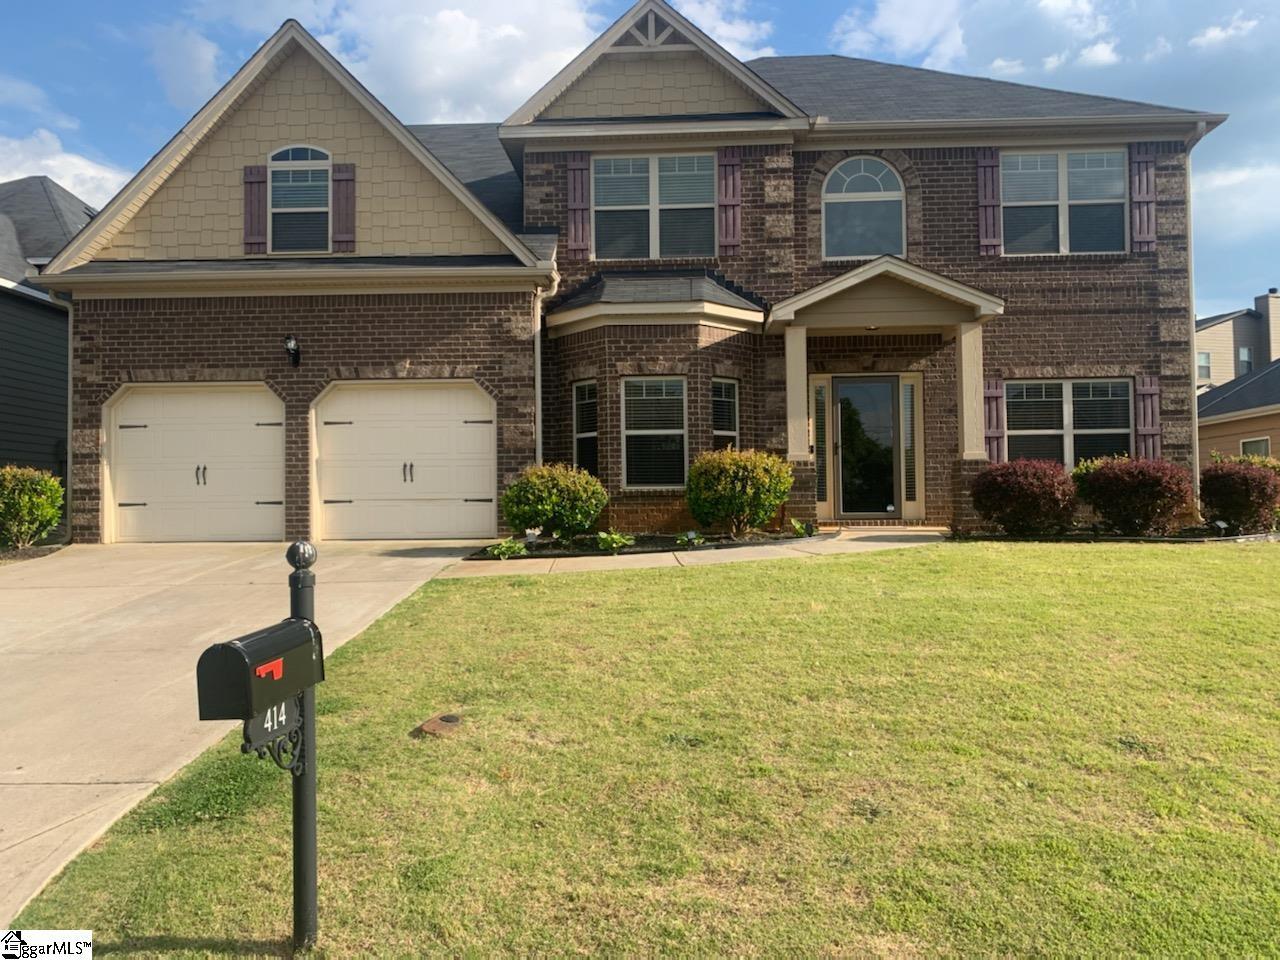 414 Springlakes Estate Drive Lyman, SC 29365